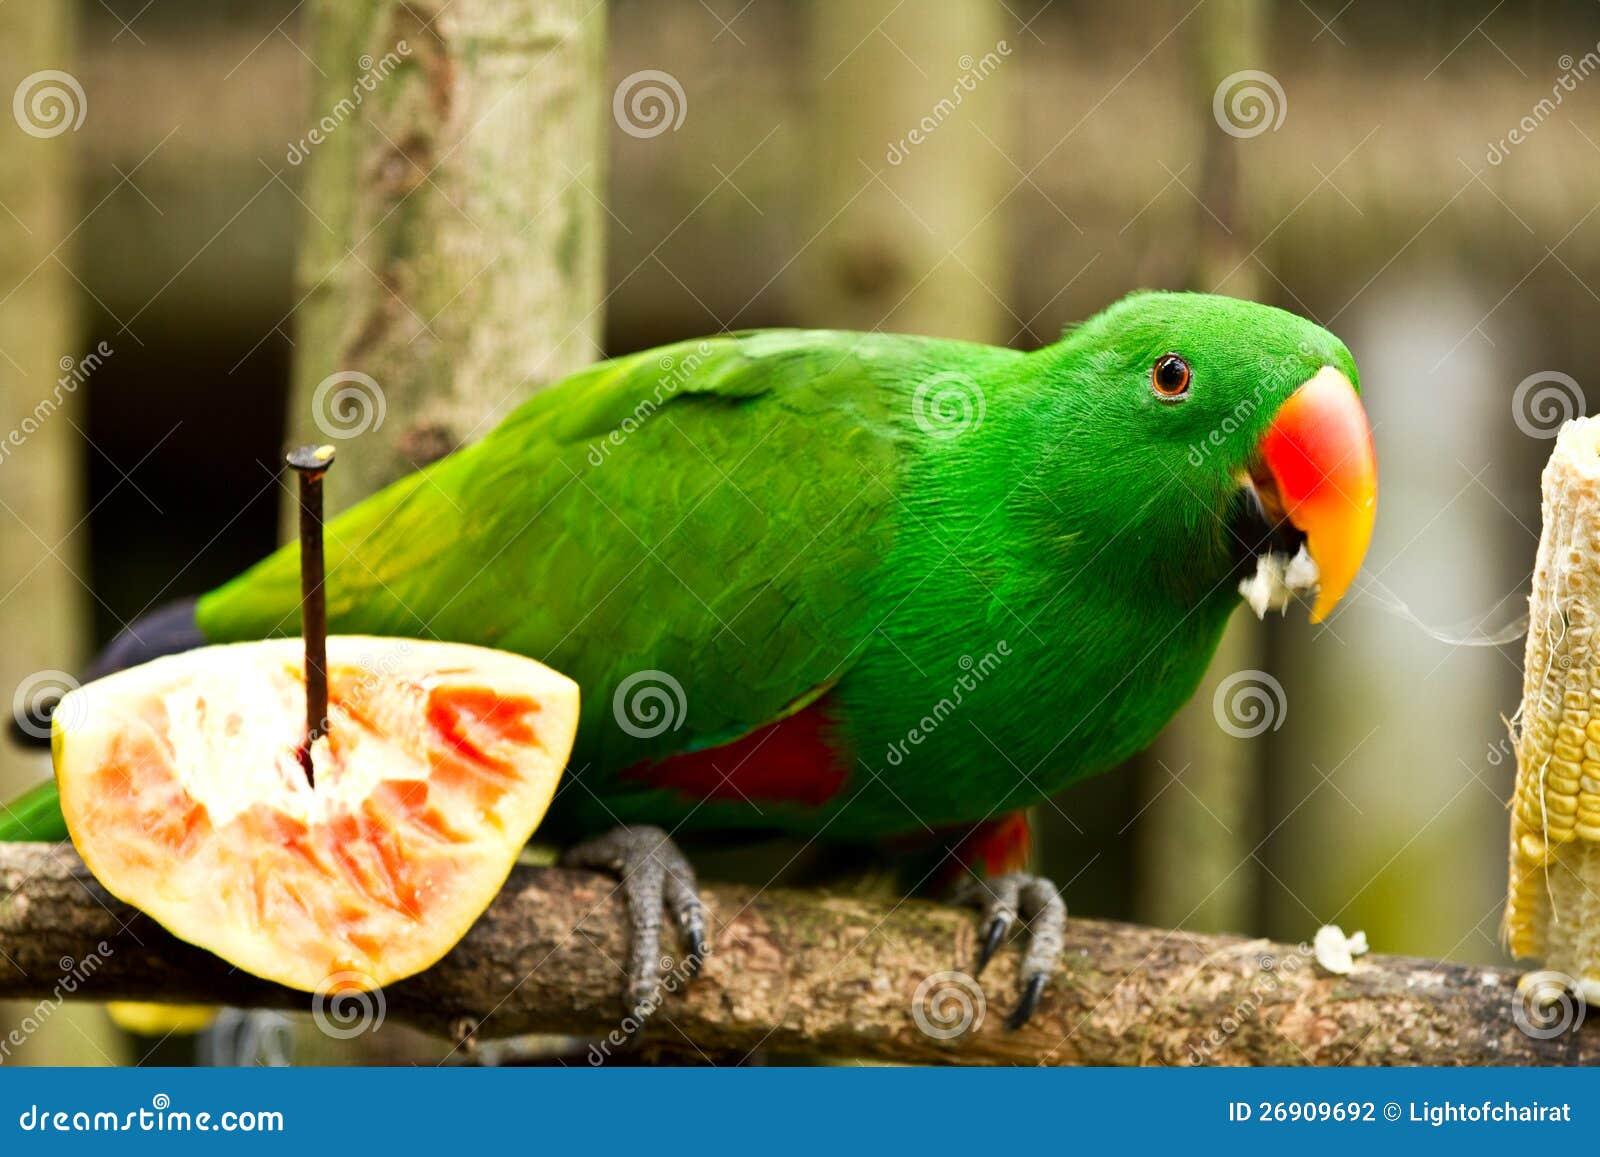 Grön parot äter havre